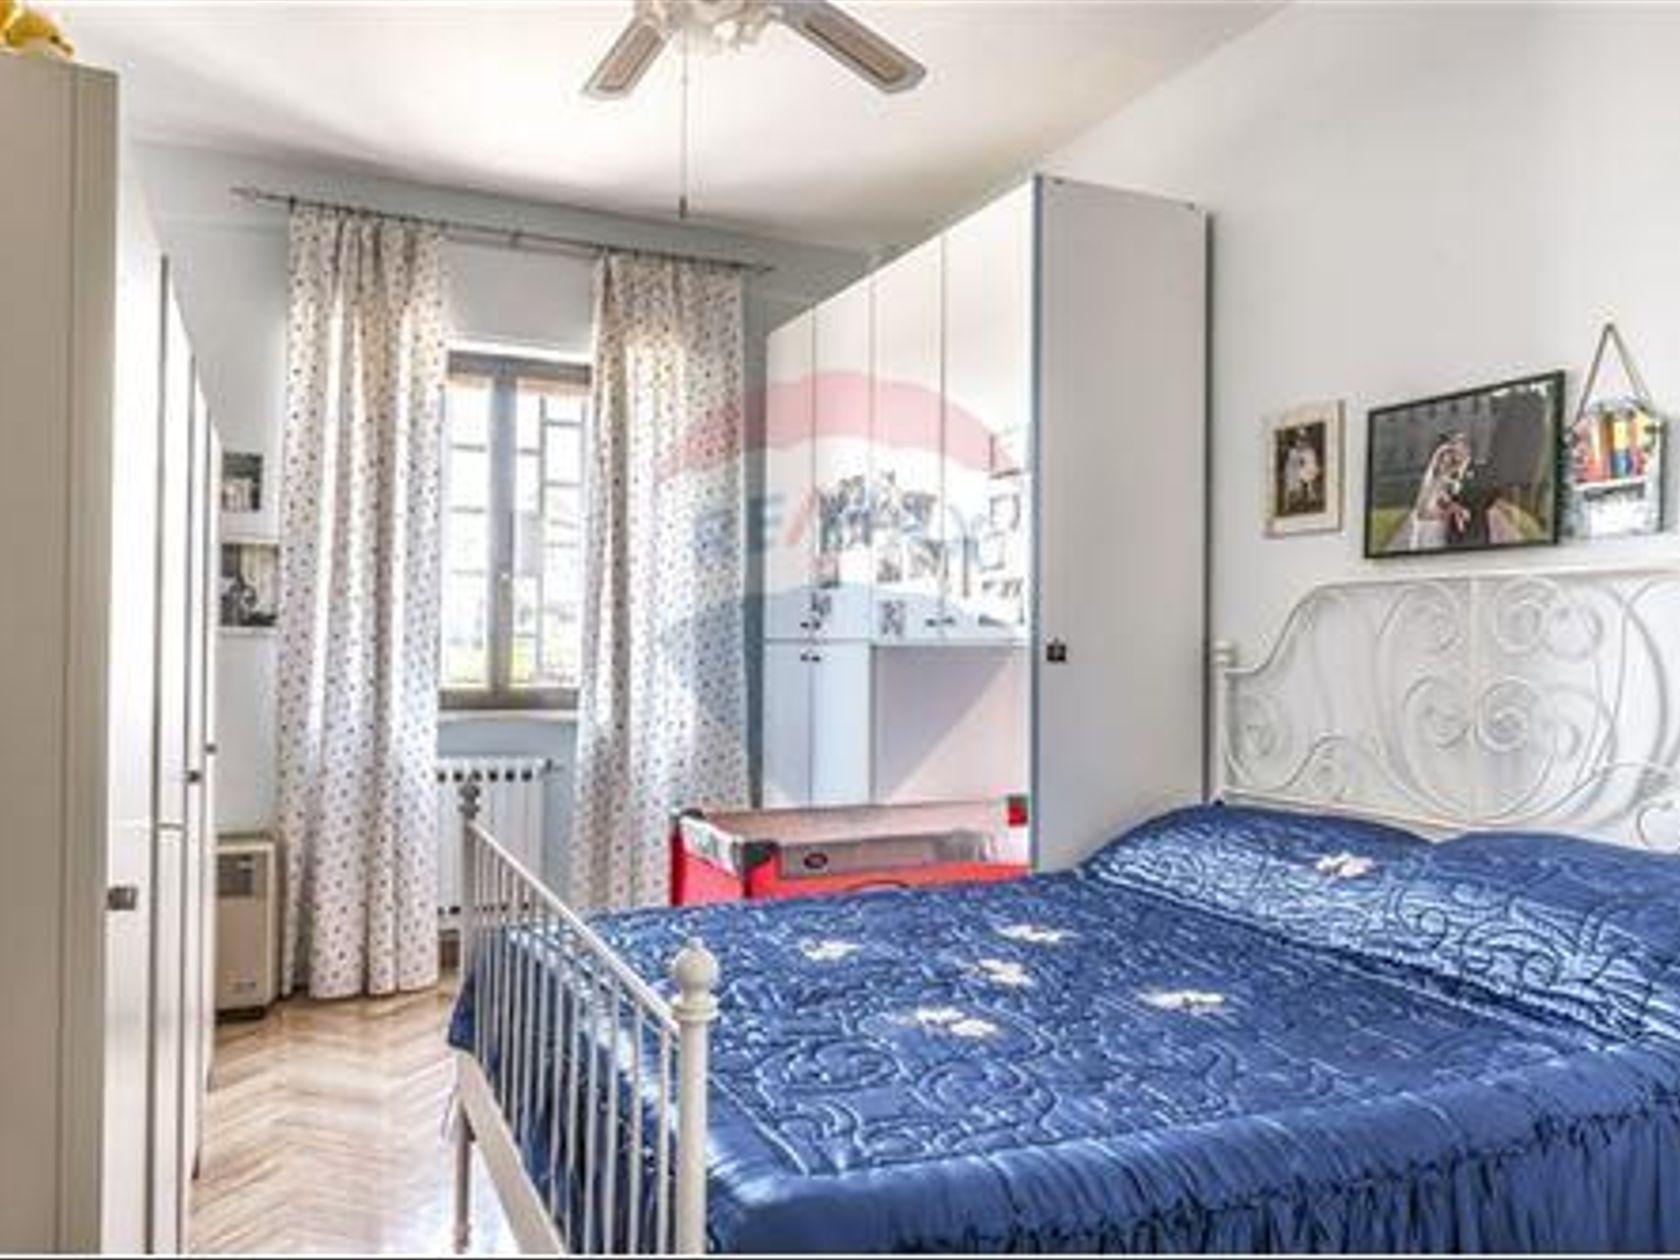 Appartamento Japigia, Bari, BA Vendita - Foto 5